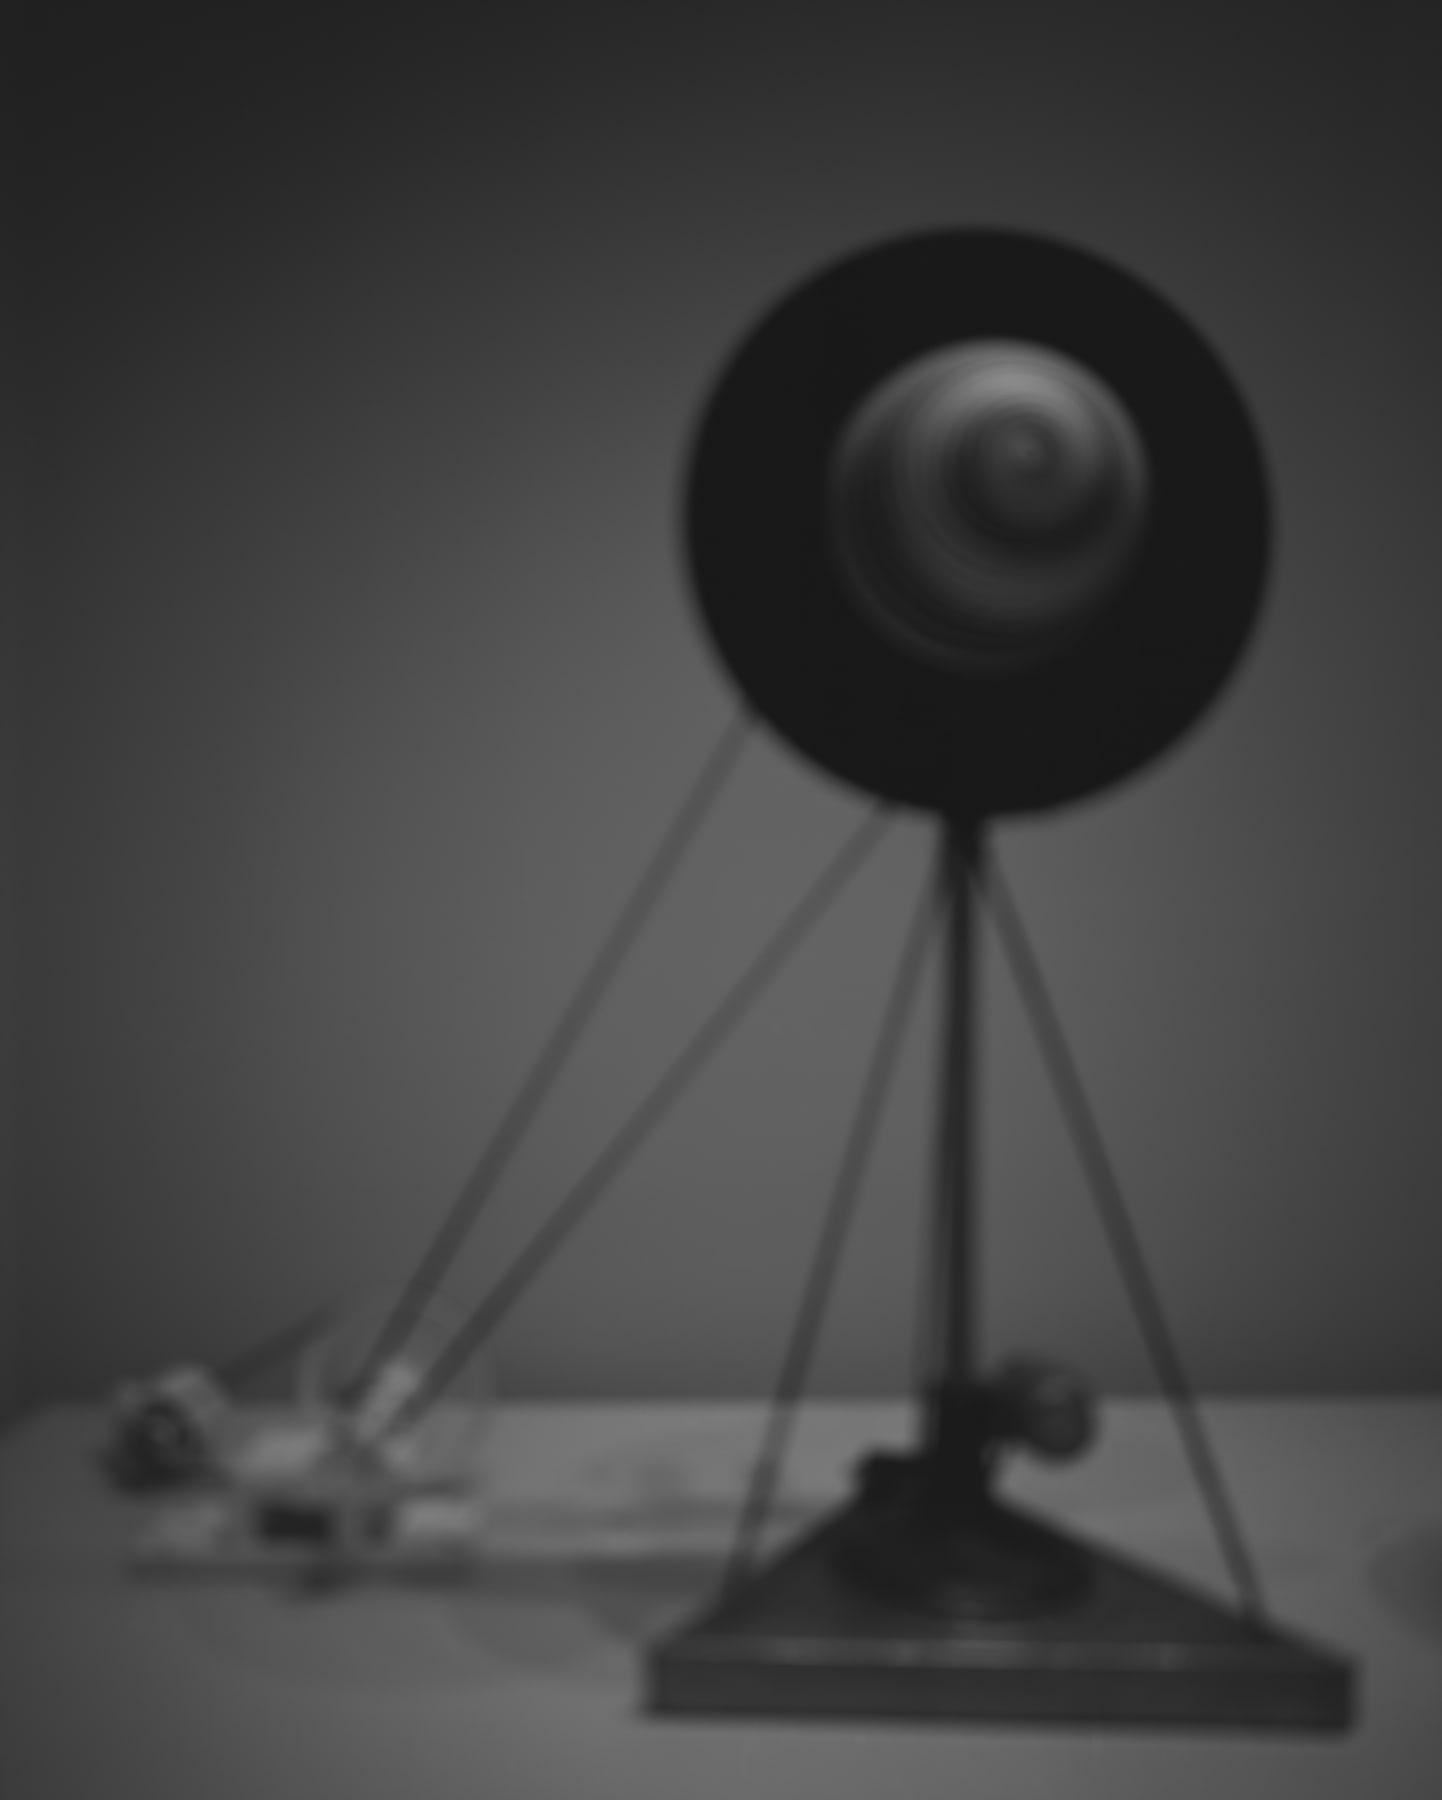 Hiroshi Sugimoto, Past Presence 023, Rotary Demisphere, Marcel Duchamp, 2013